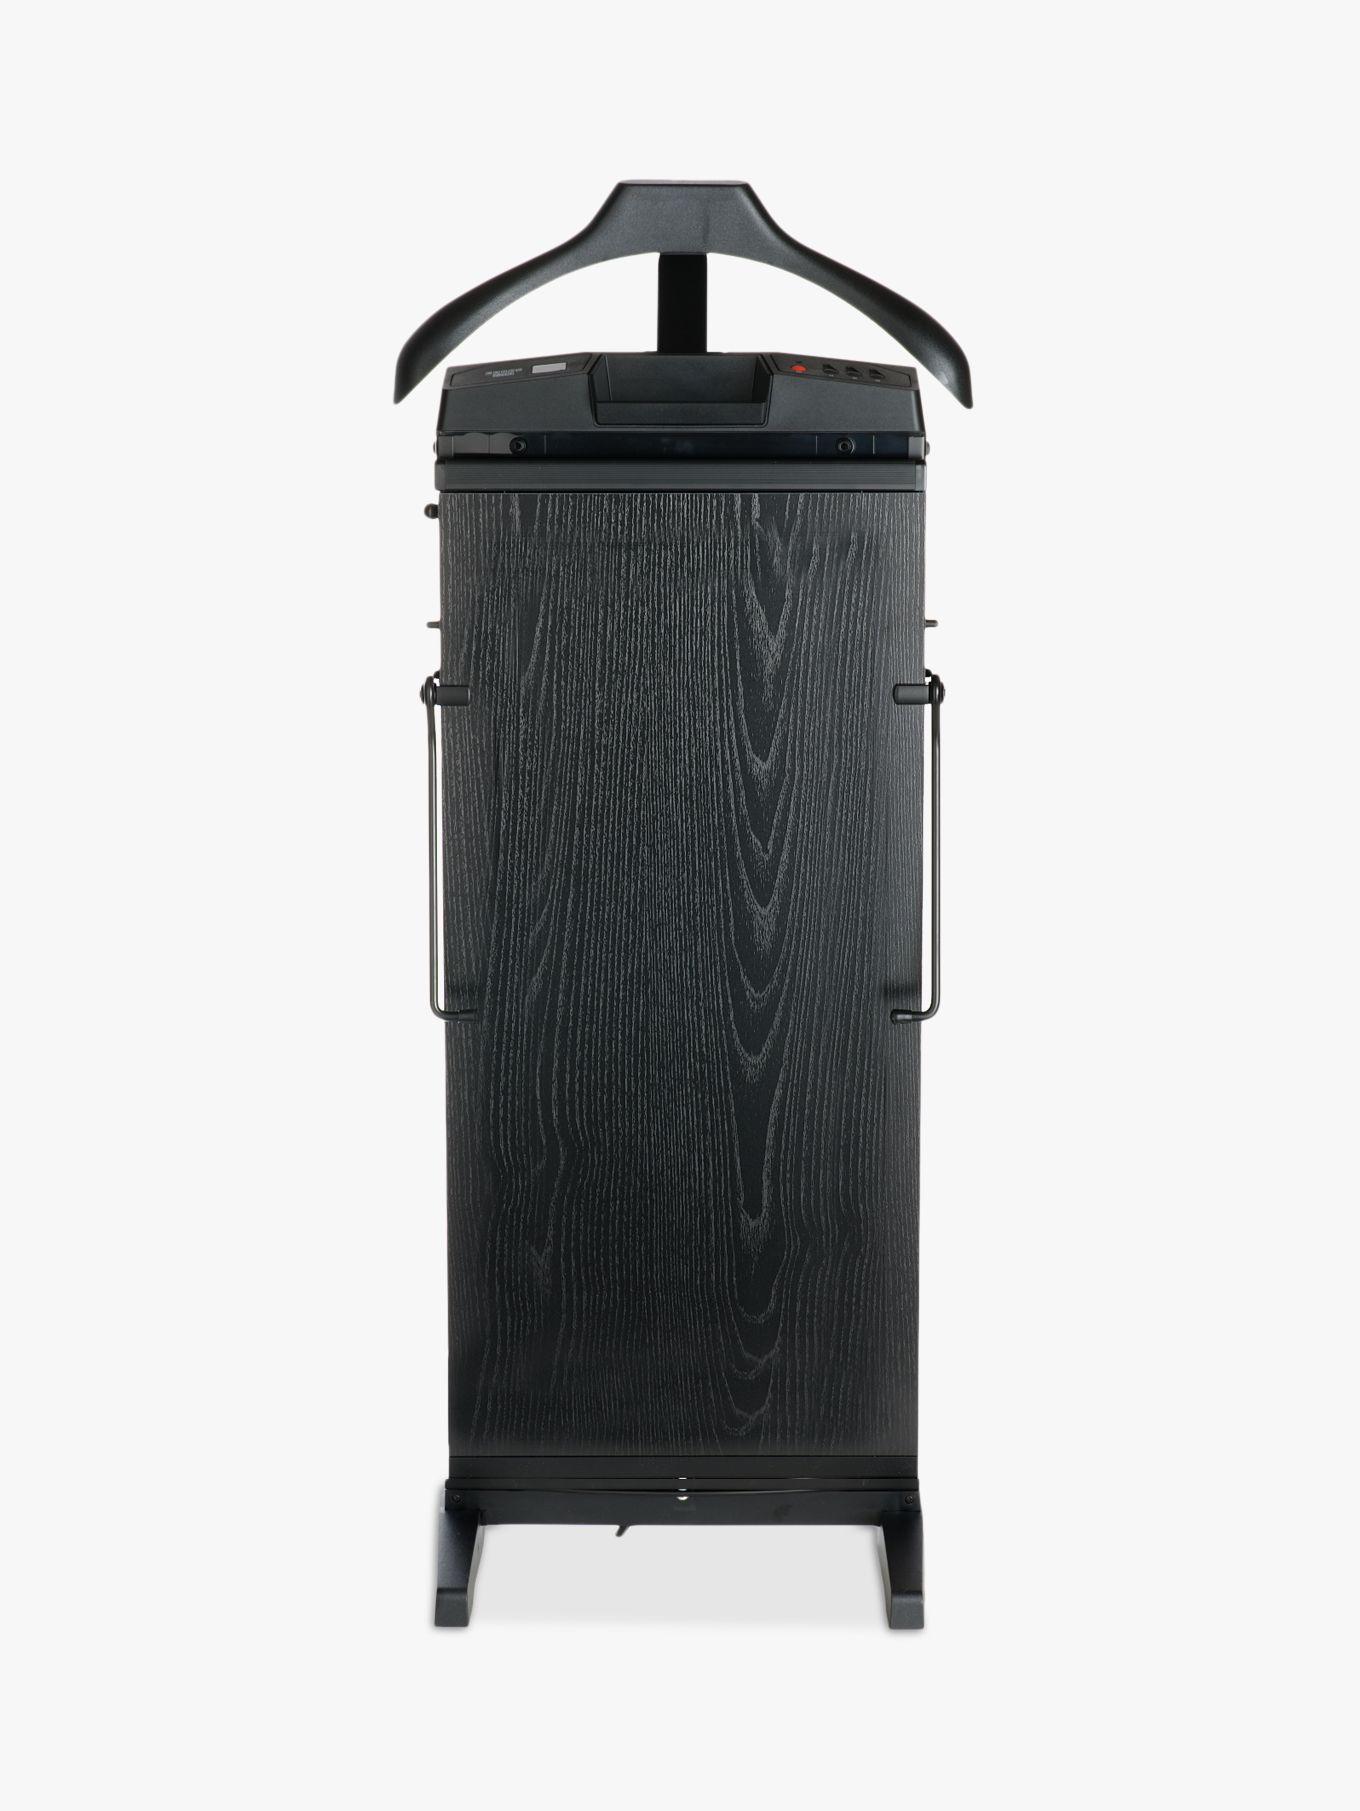 Corby 7700 Trouser Press Black Ash At John Lewis Partners